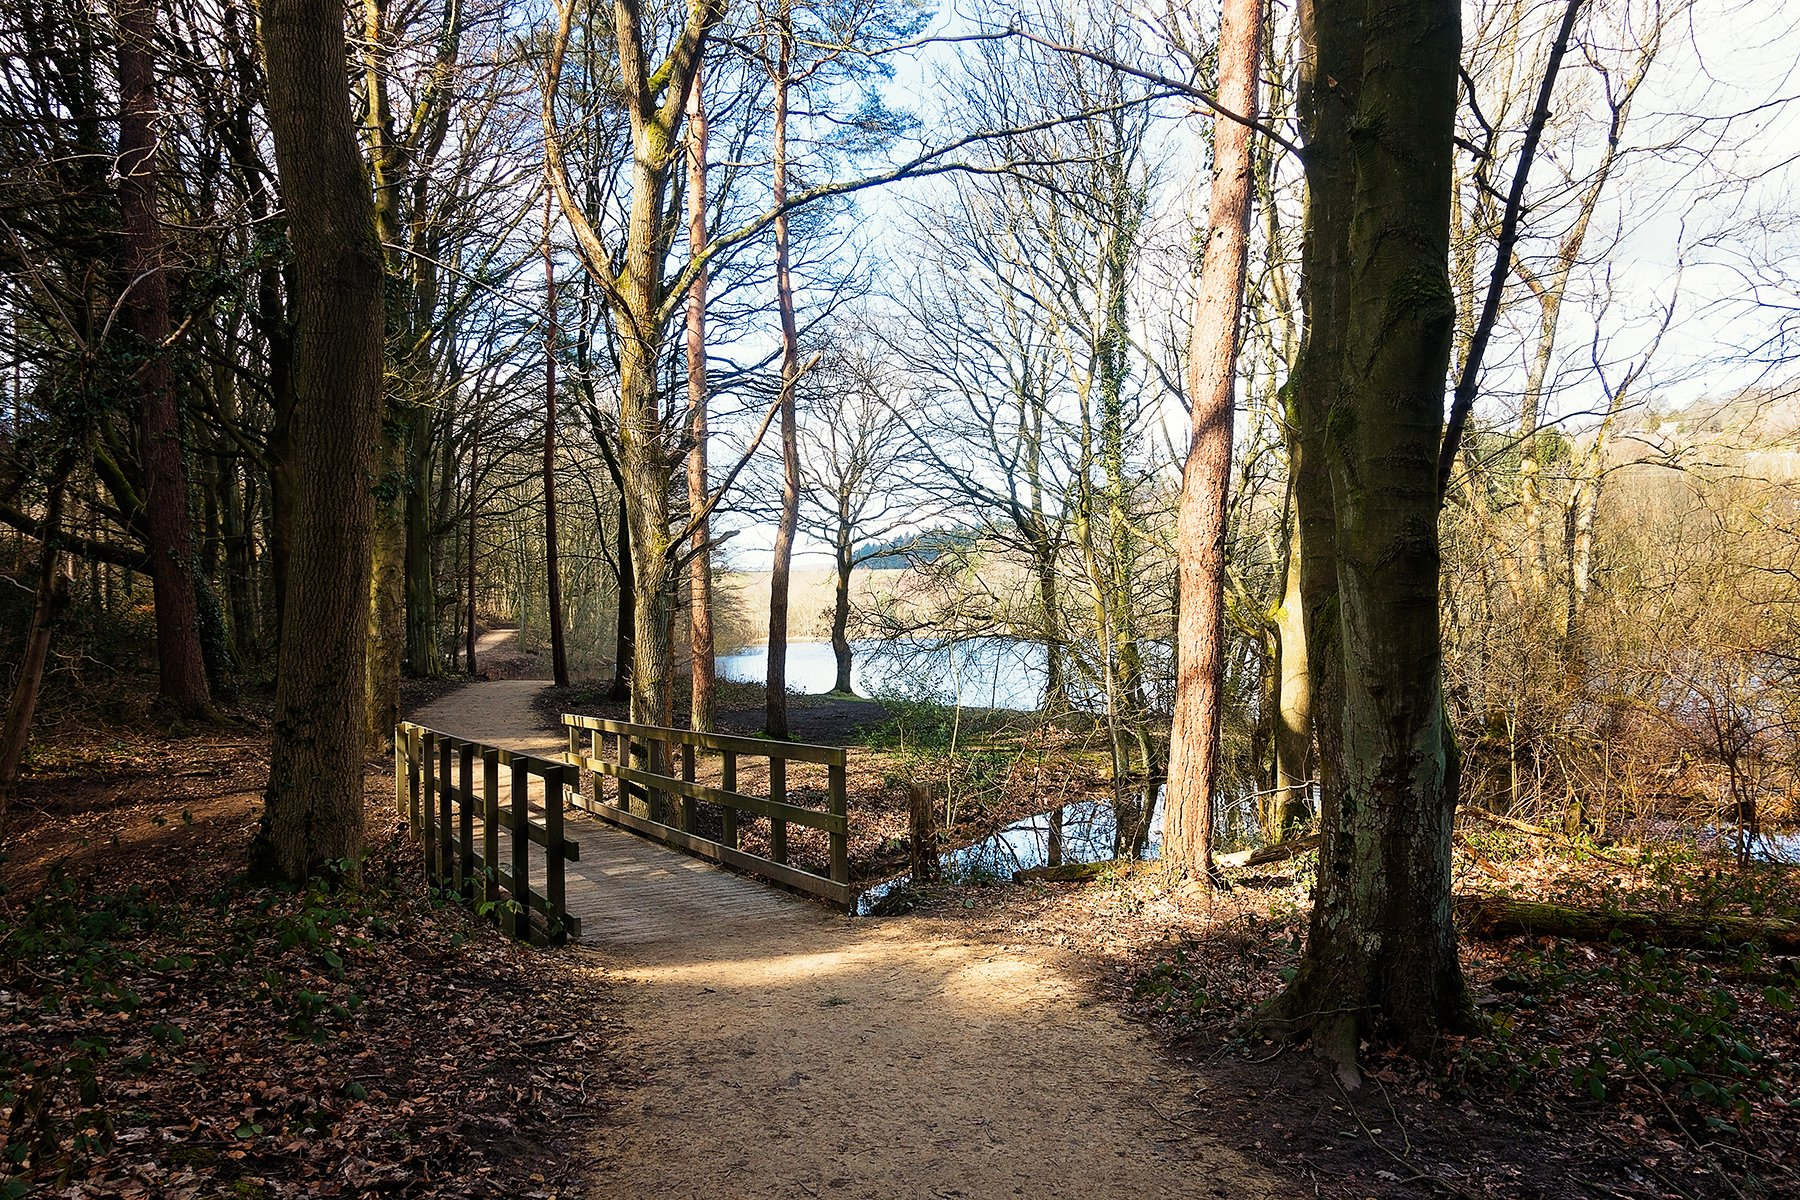 Walking around More Hall Reservoir